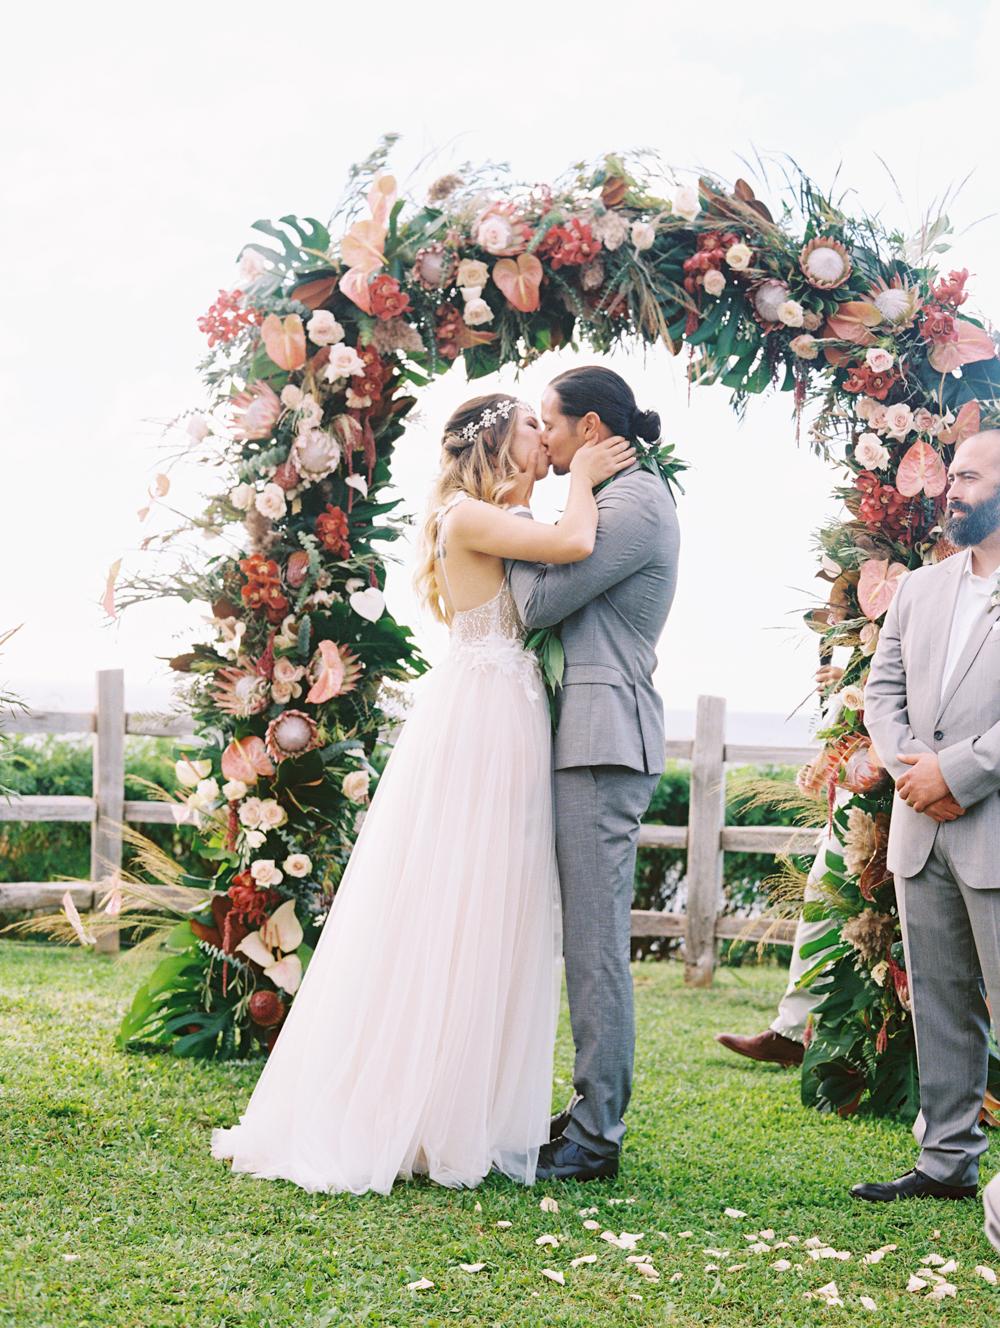 maui wedding at kapalua montage by maui photographer wendy laurel